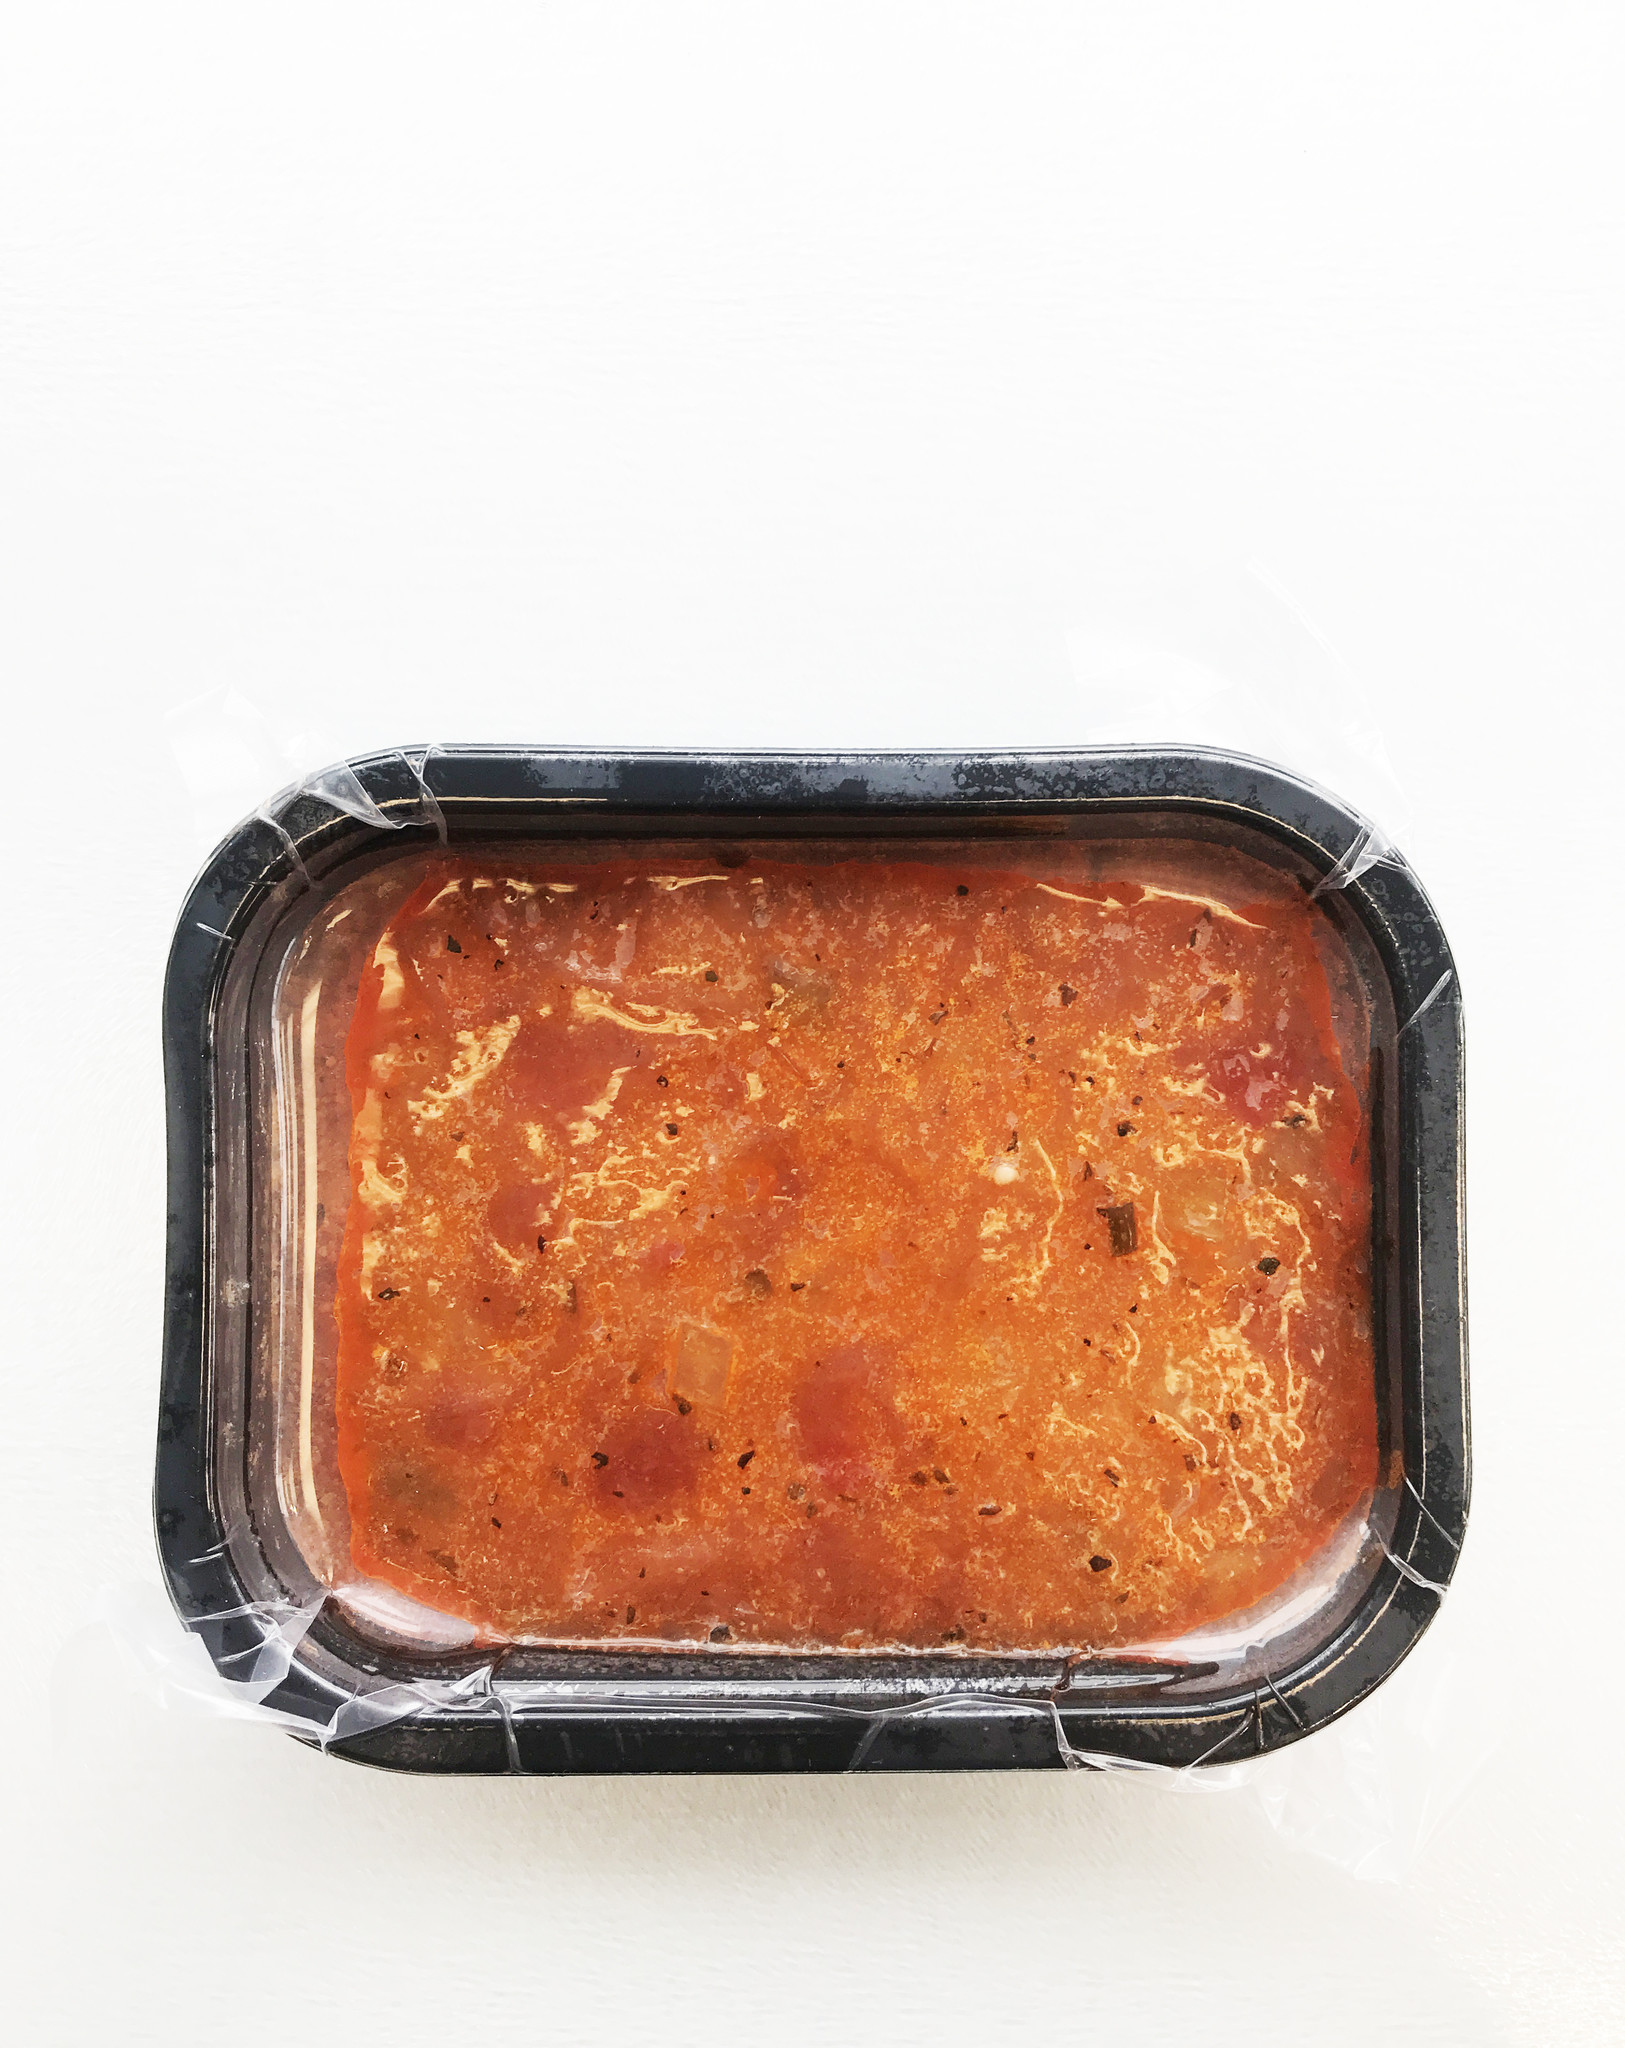 Italian orzo  vegan soup meal (325g)